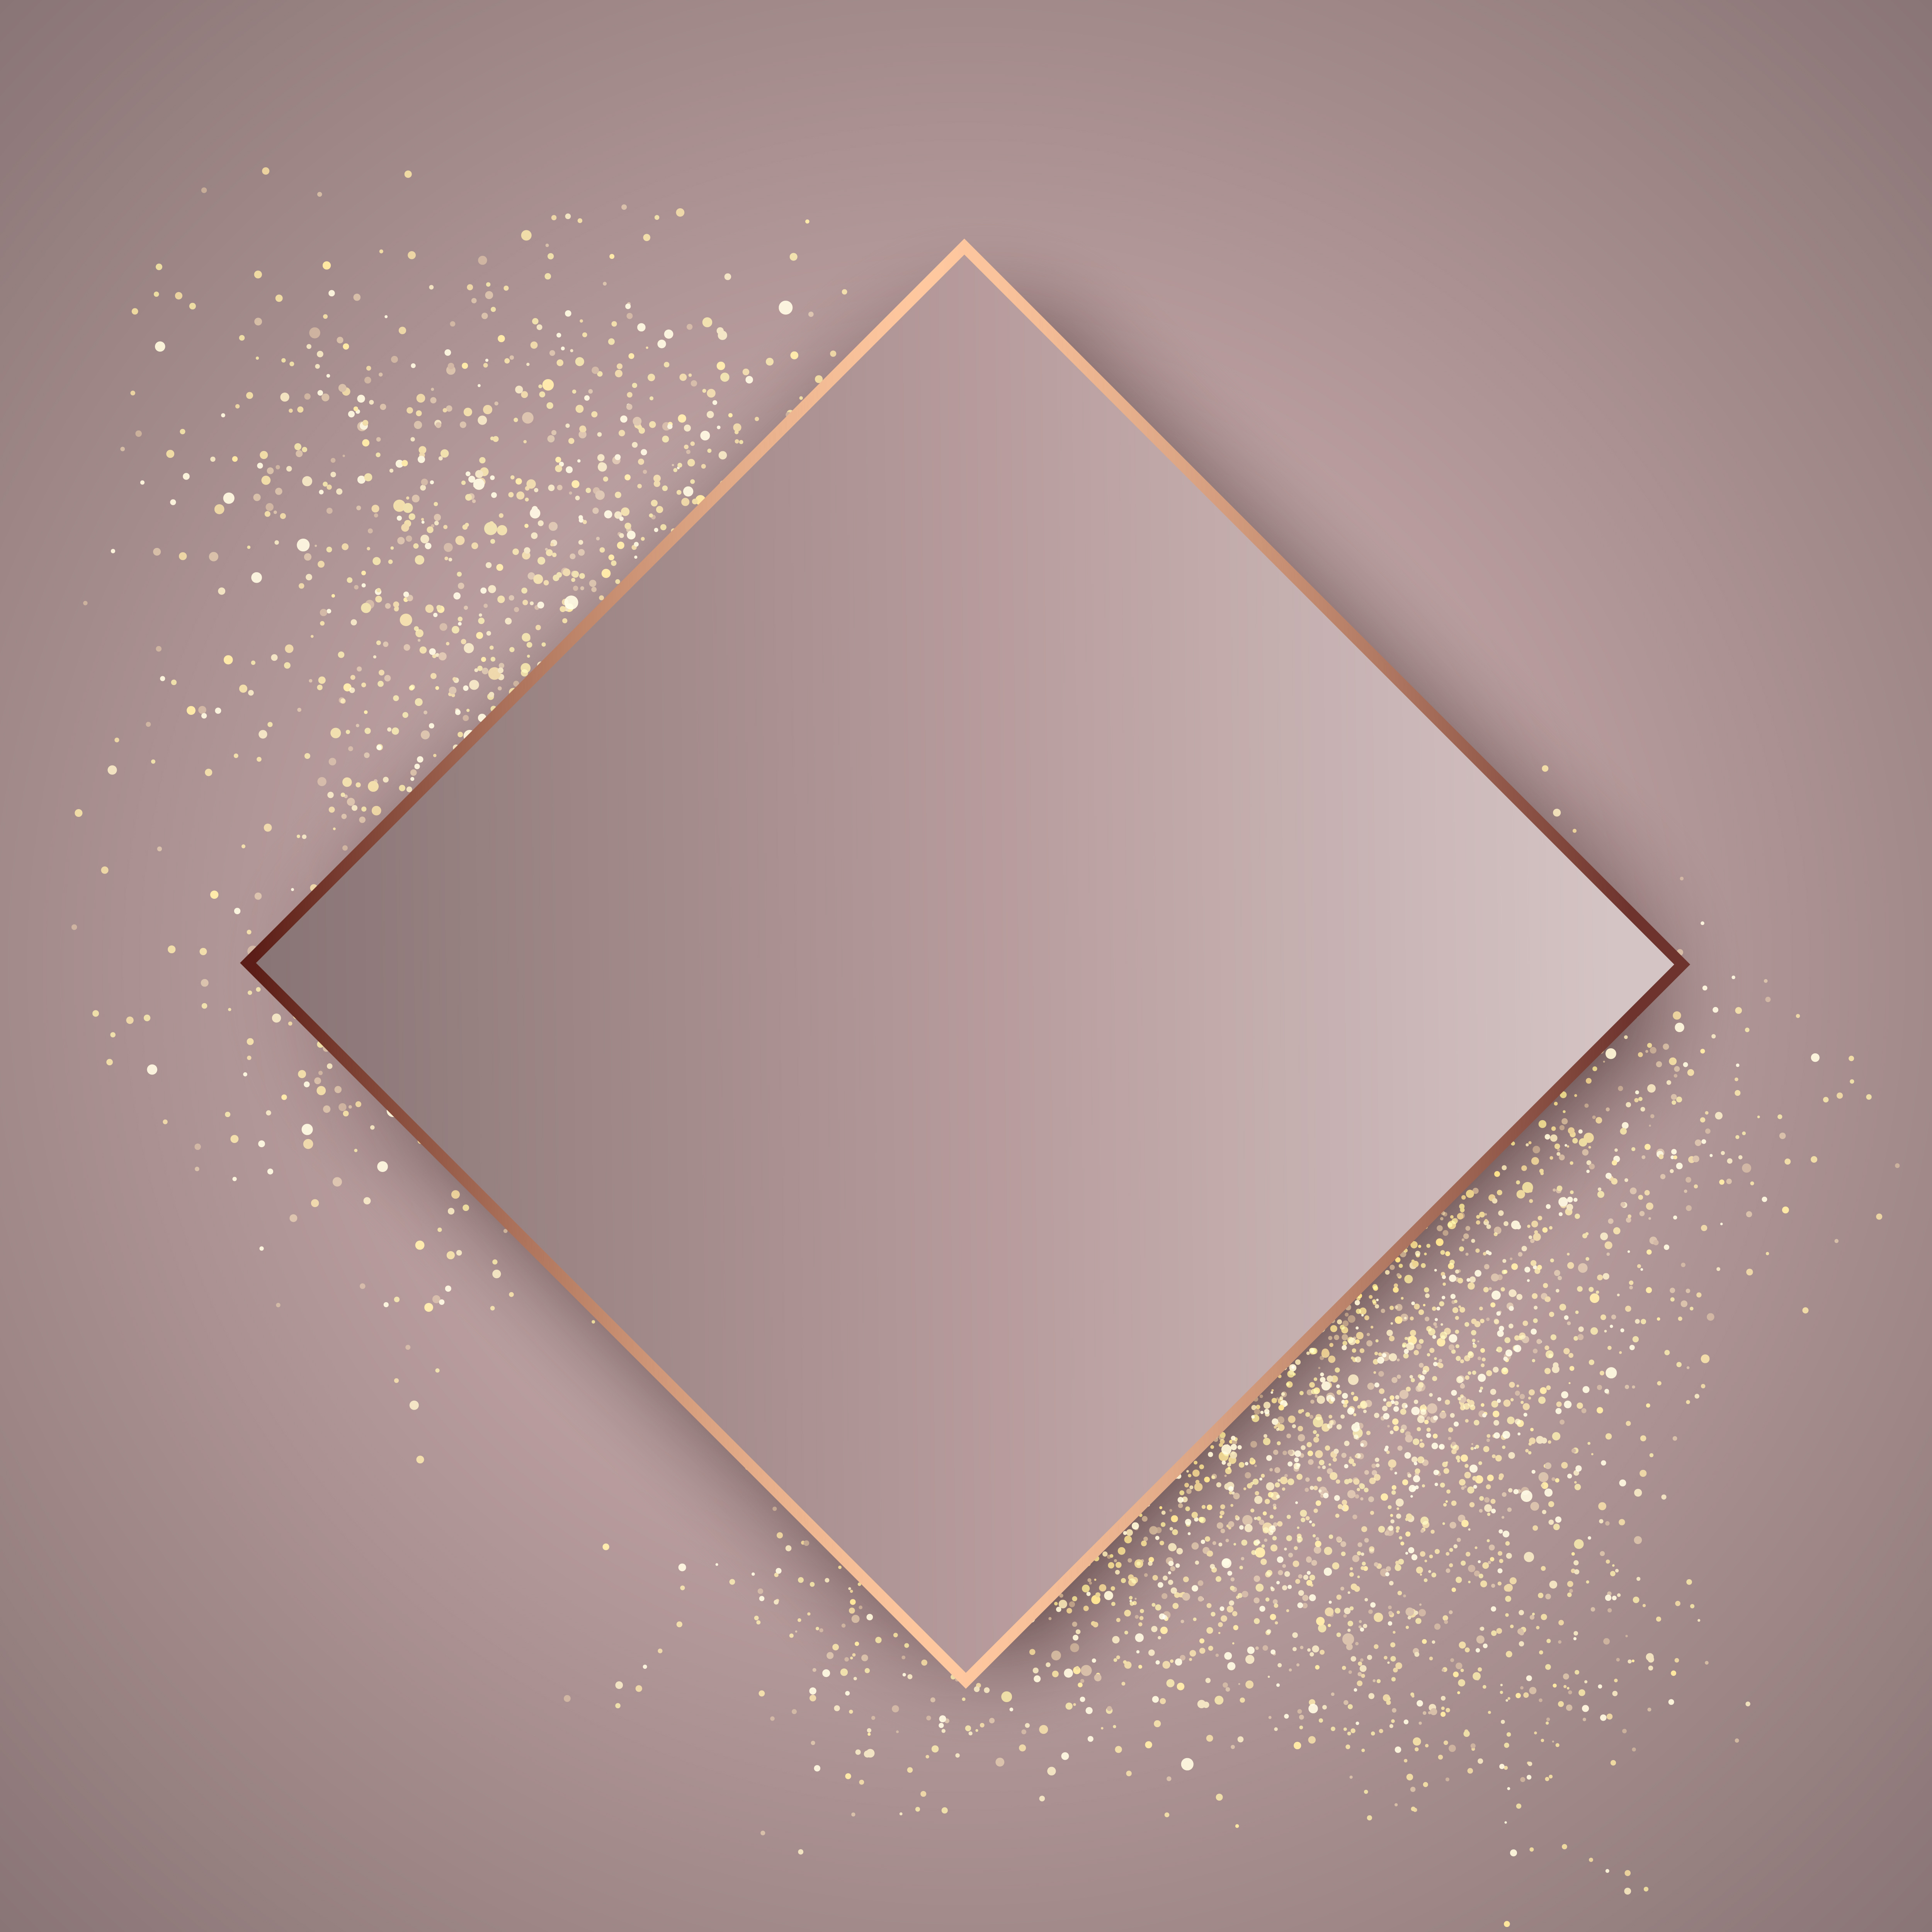 Rose Gold Glitter Background Download Free Vectors